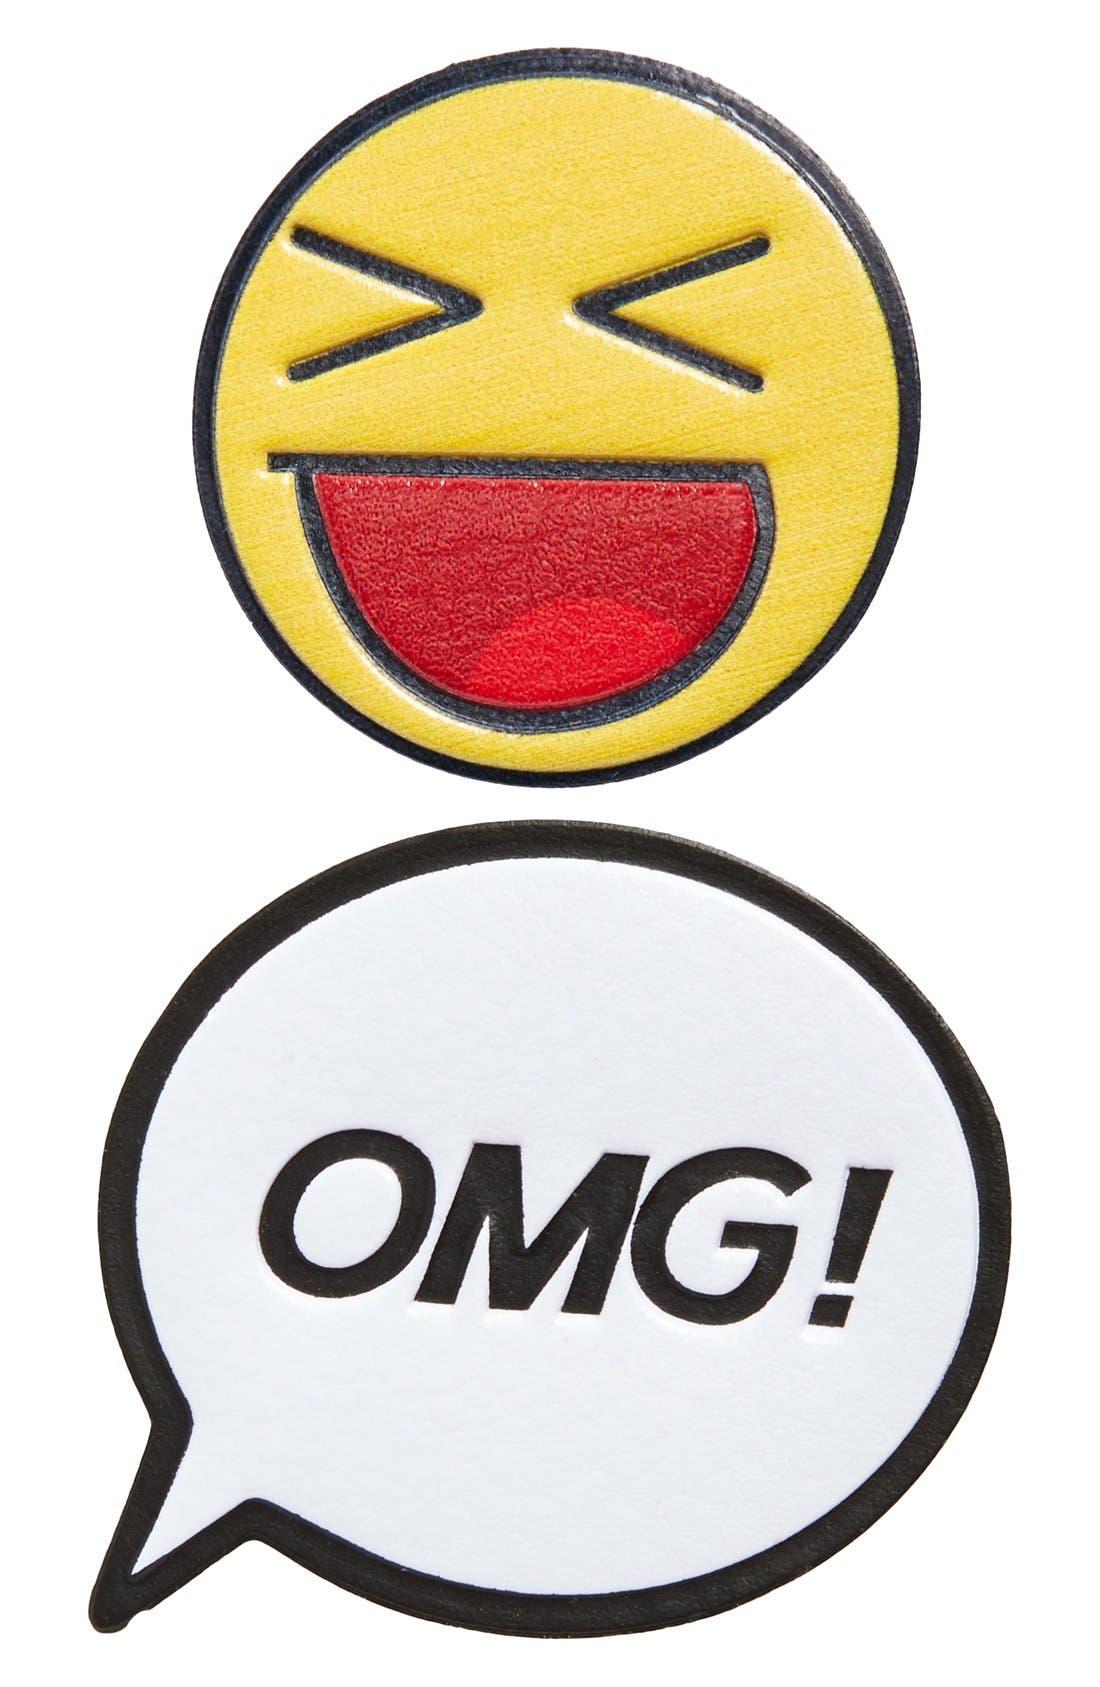 Main Image - Skinnydip 'OMG!' Plushie Stickers (Set of 2)